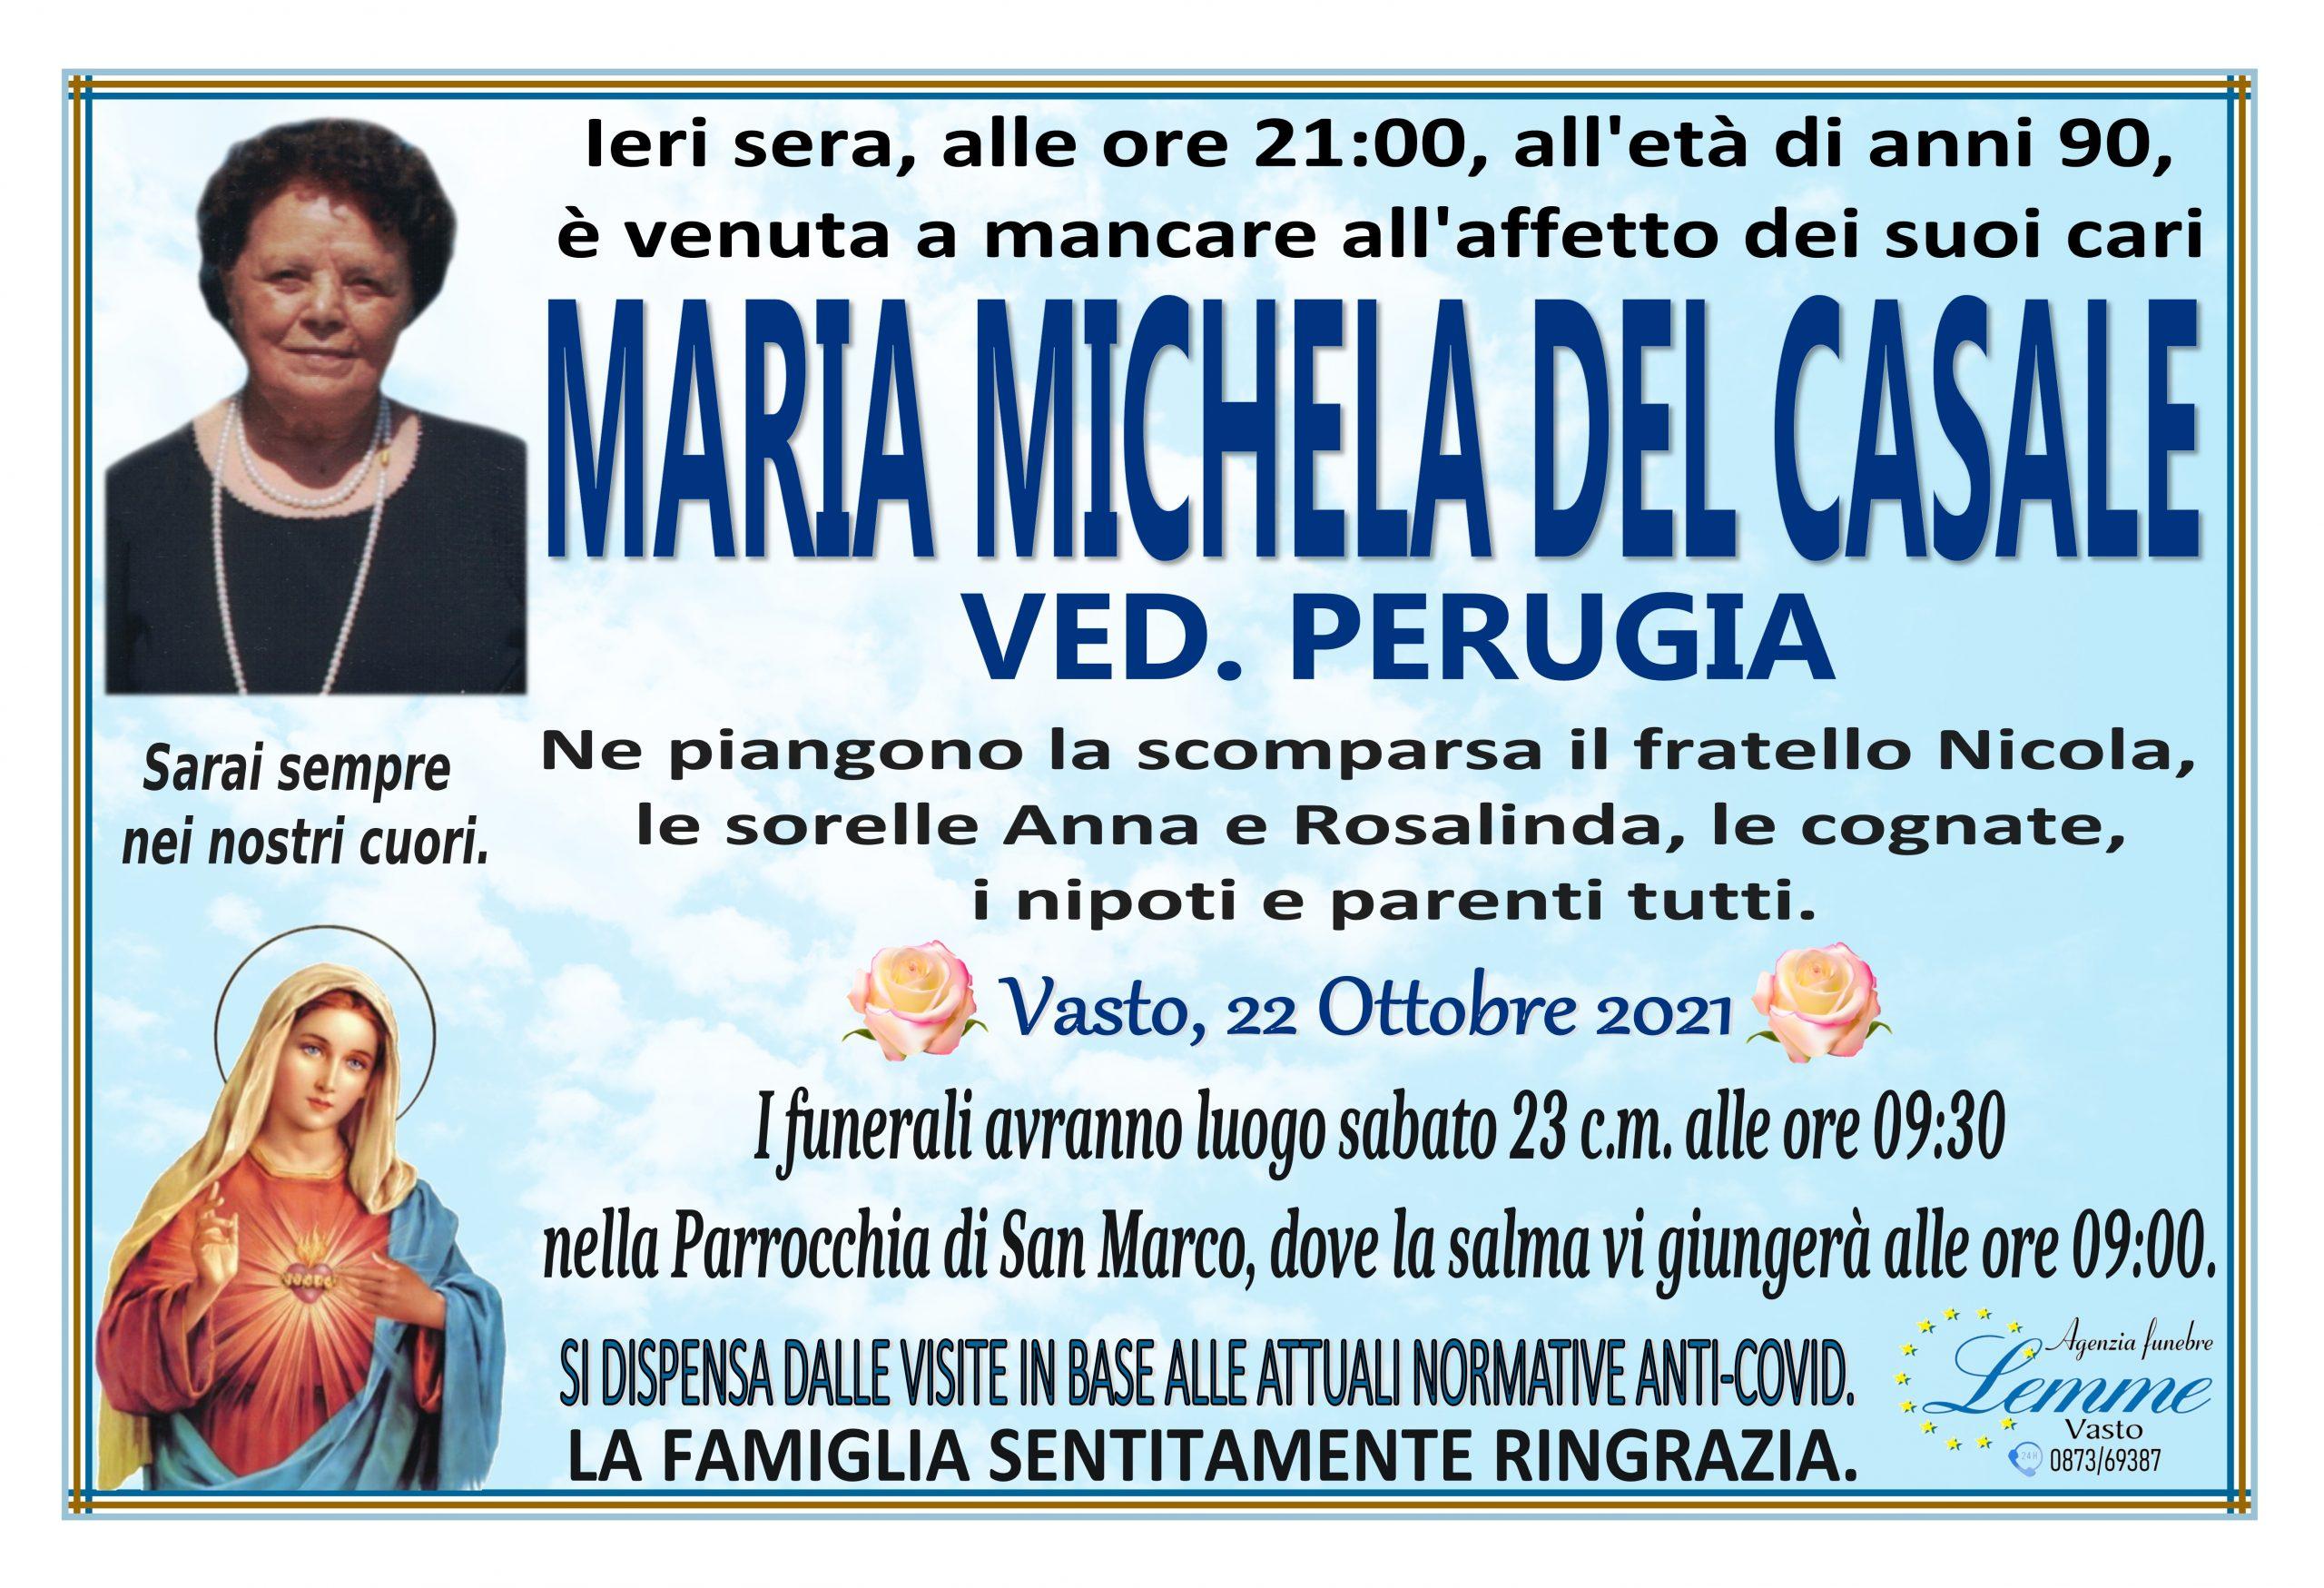 MARIA MICHELA DEL CASALE